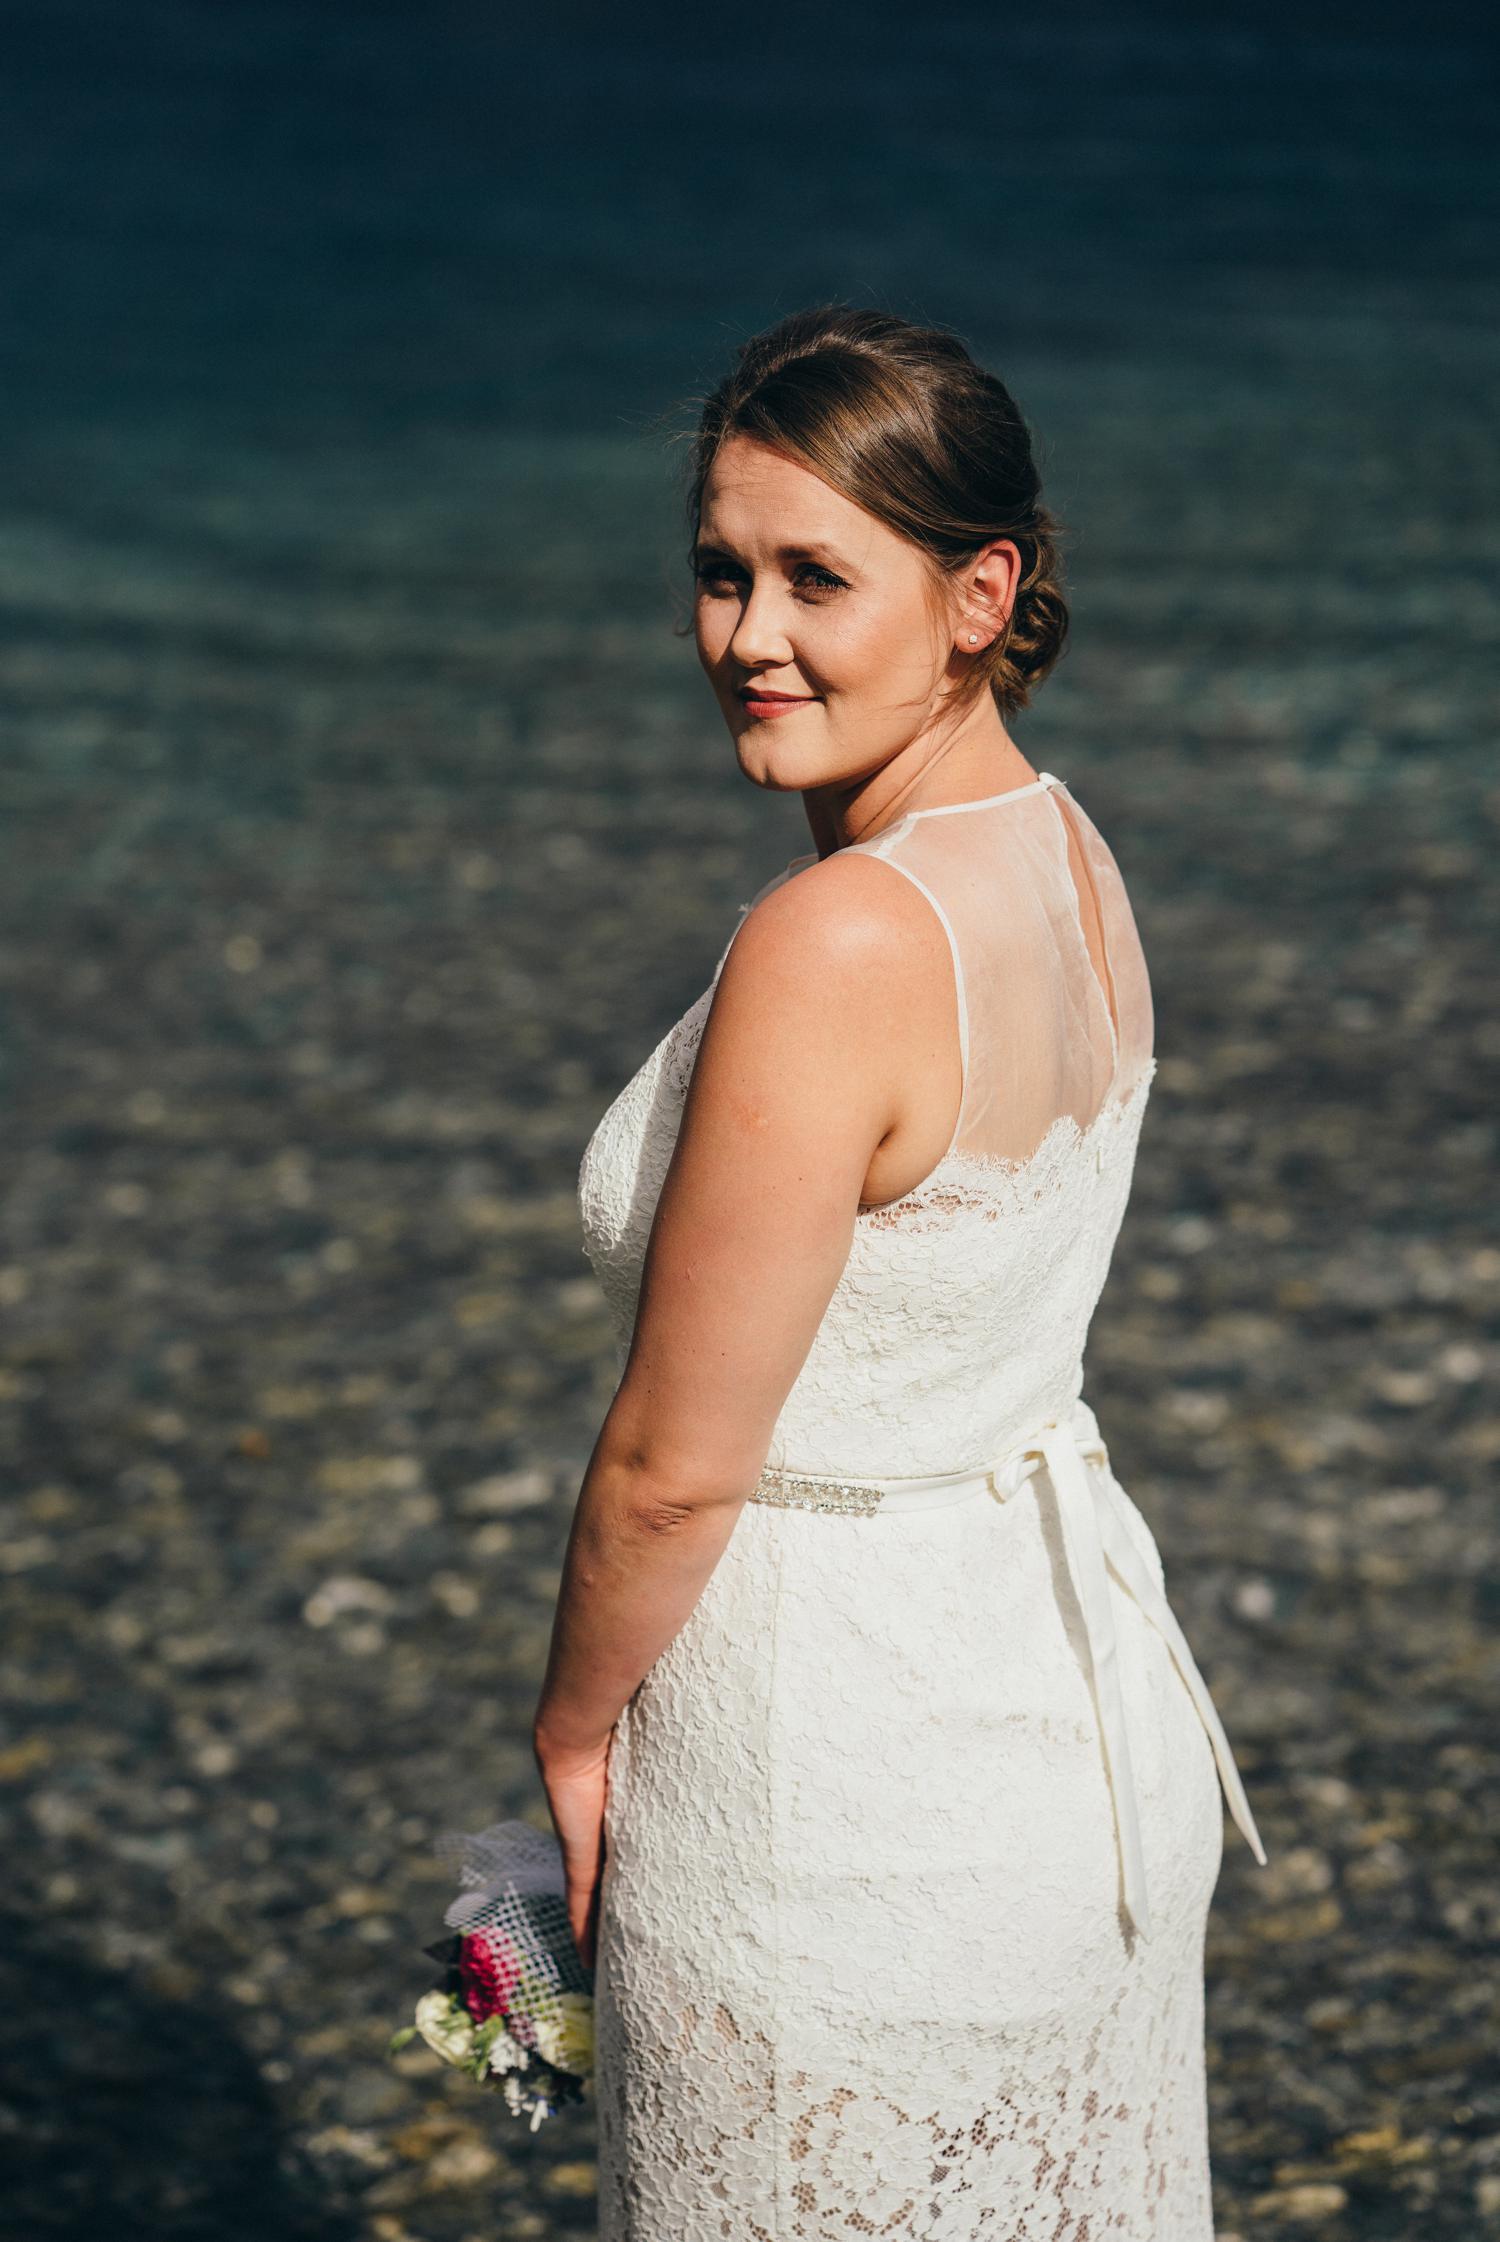 Queenstown lake bride